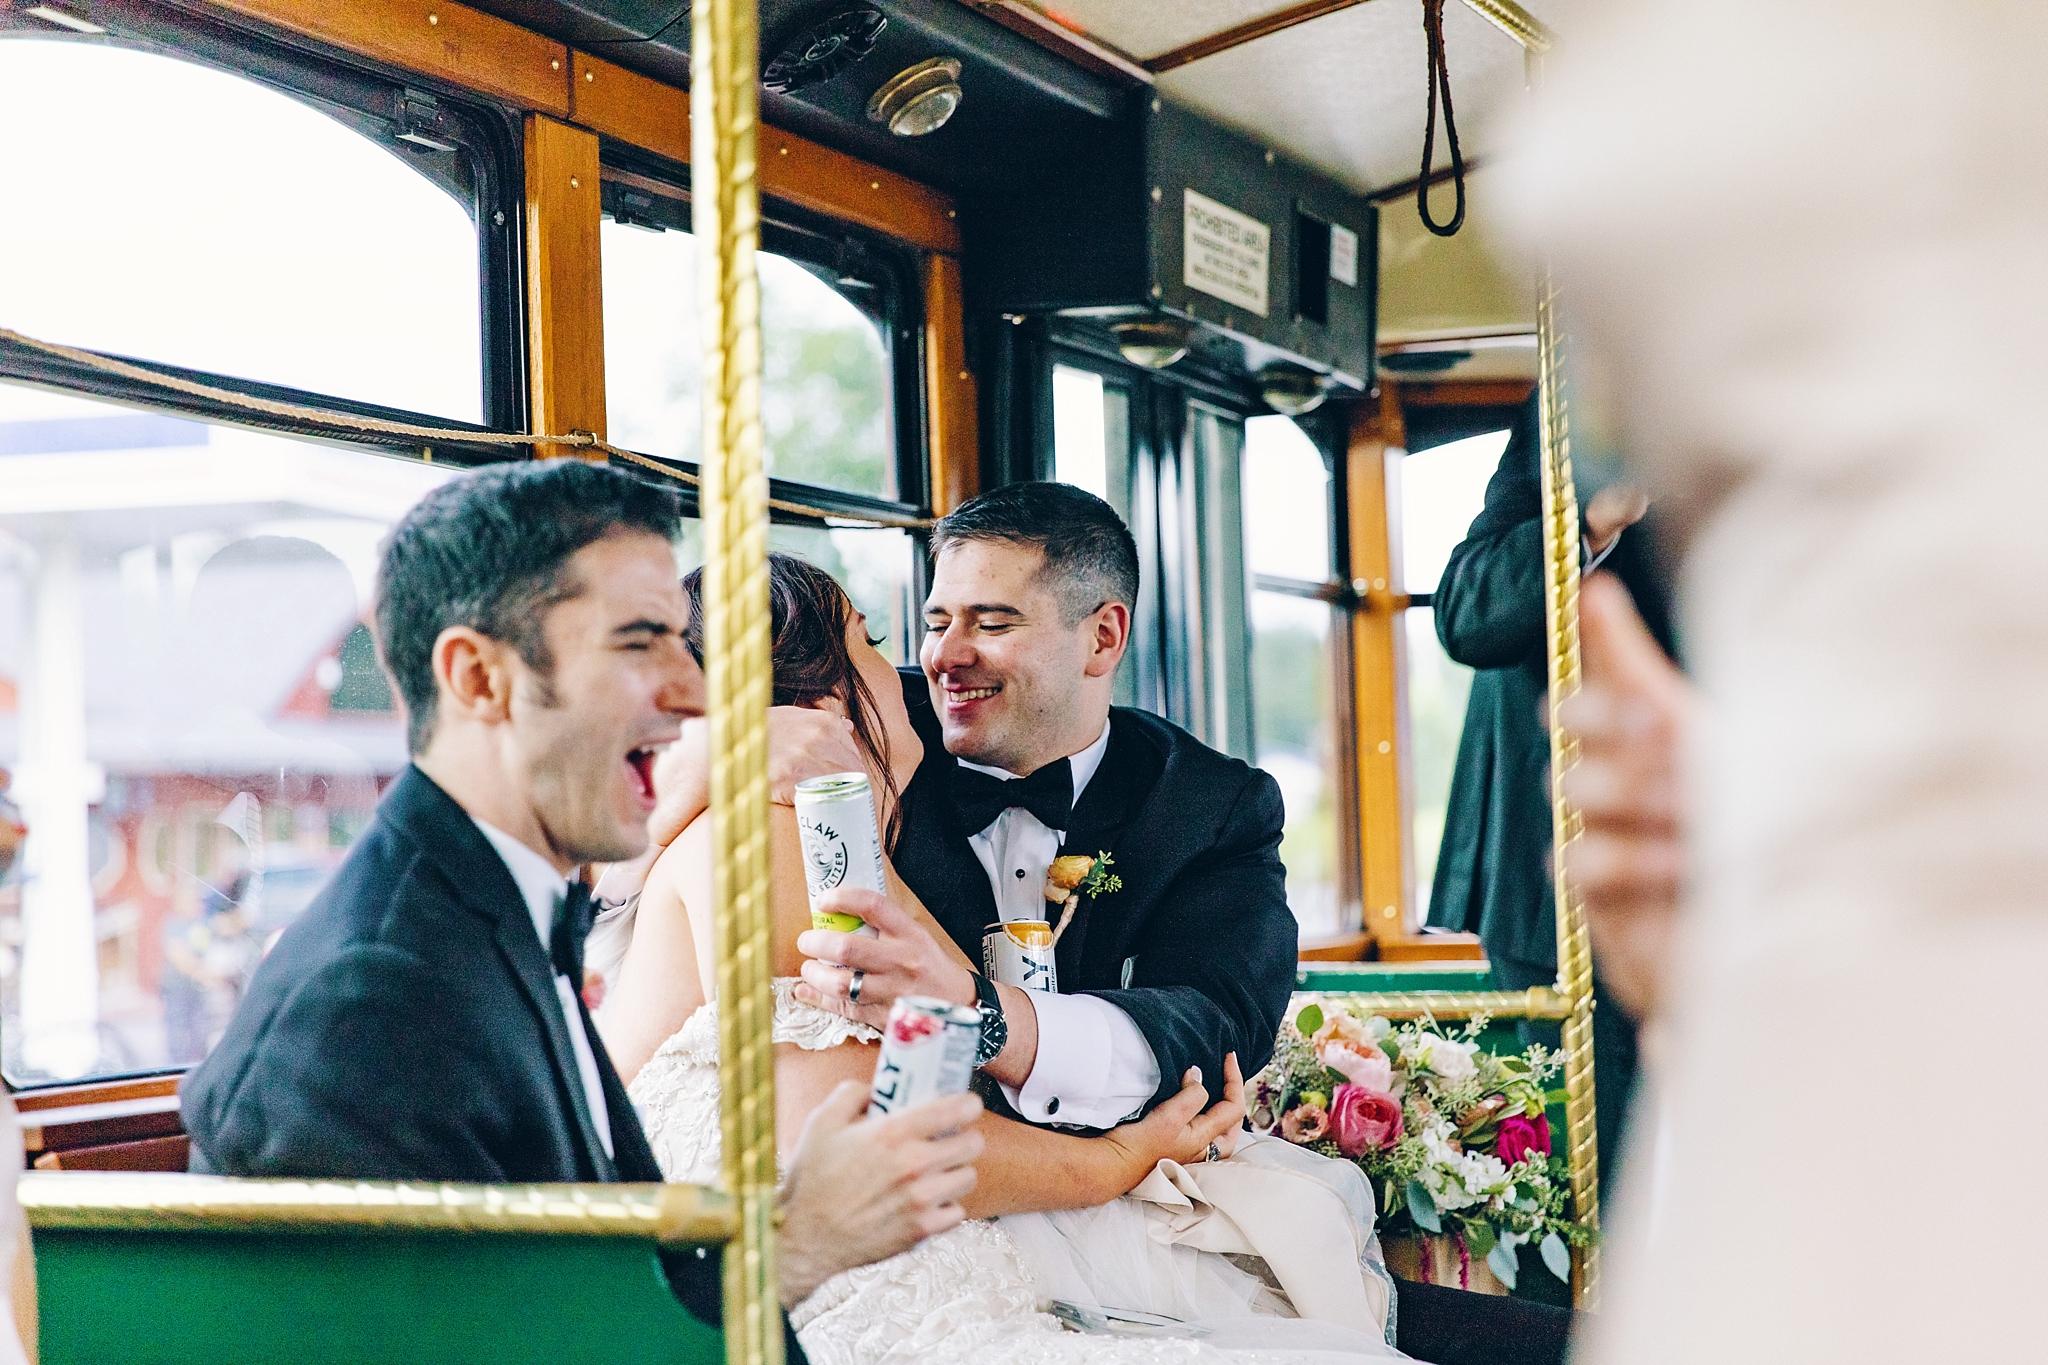 baker-lofts-holland-michigan-wedding-photographer_0372.jpg